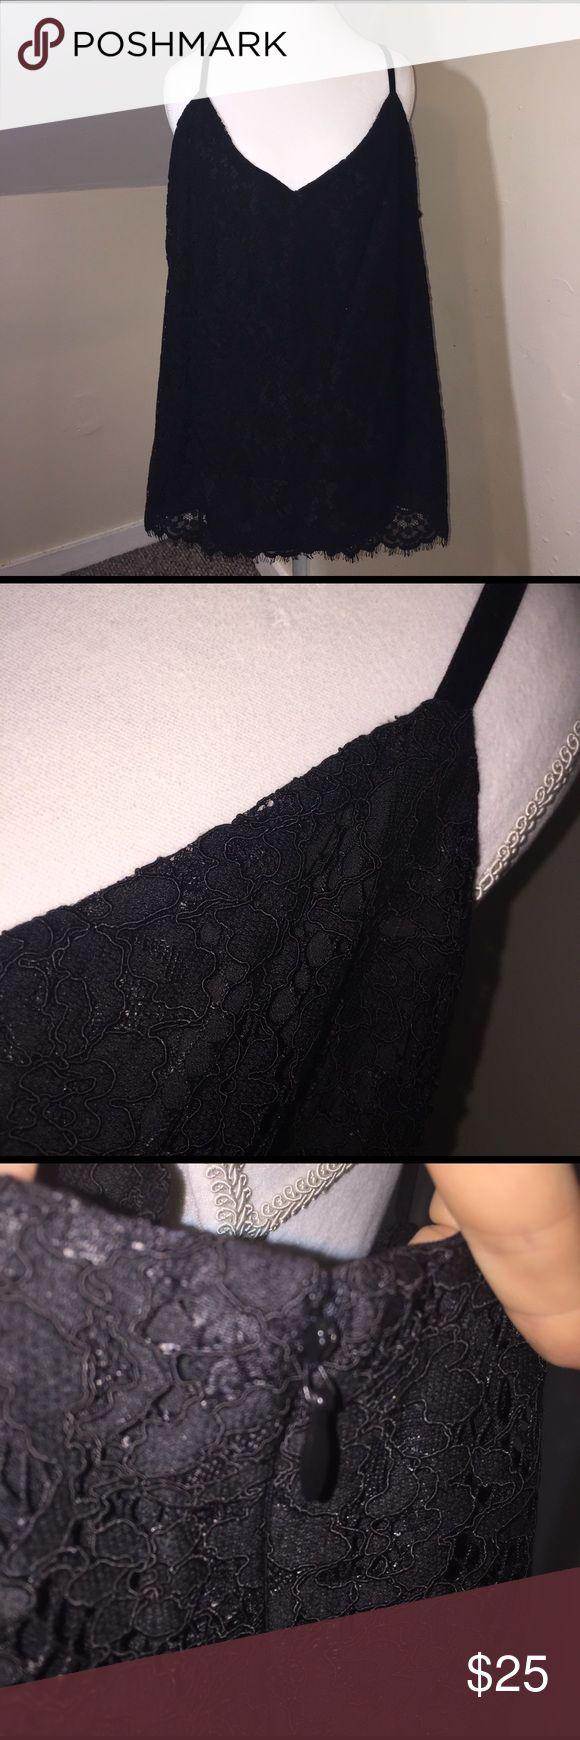 NWT Ralph Lauren Black Lace Tank Top Beautiful black Lace Tank Top with zipper closure. BRAND NEW! This has a underlay under the lace! Lauren Ralph Lauren Tops Tank Tops